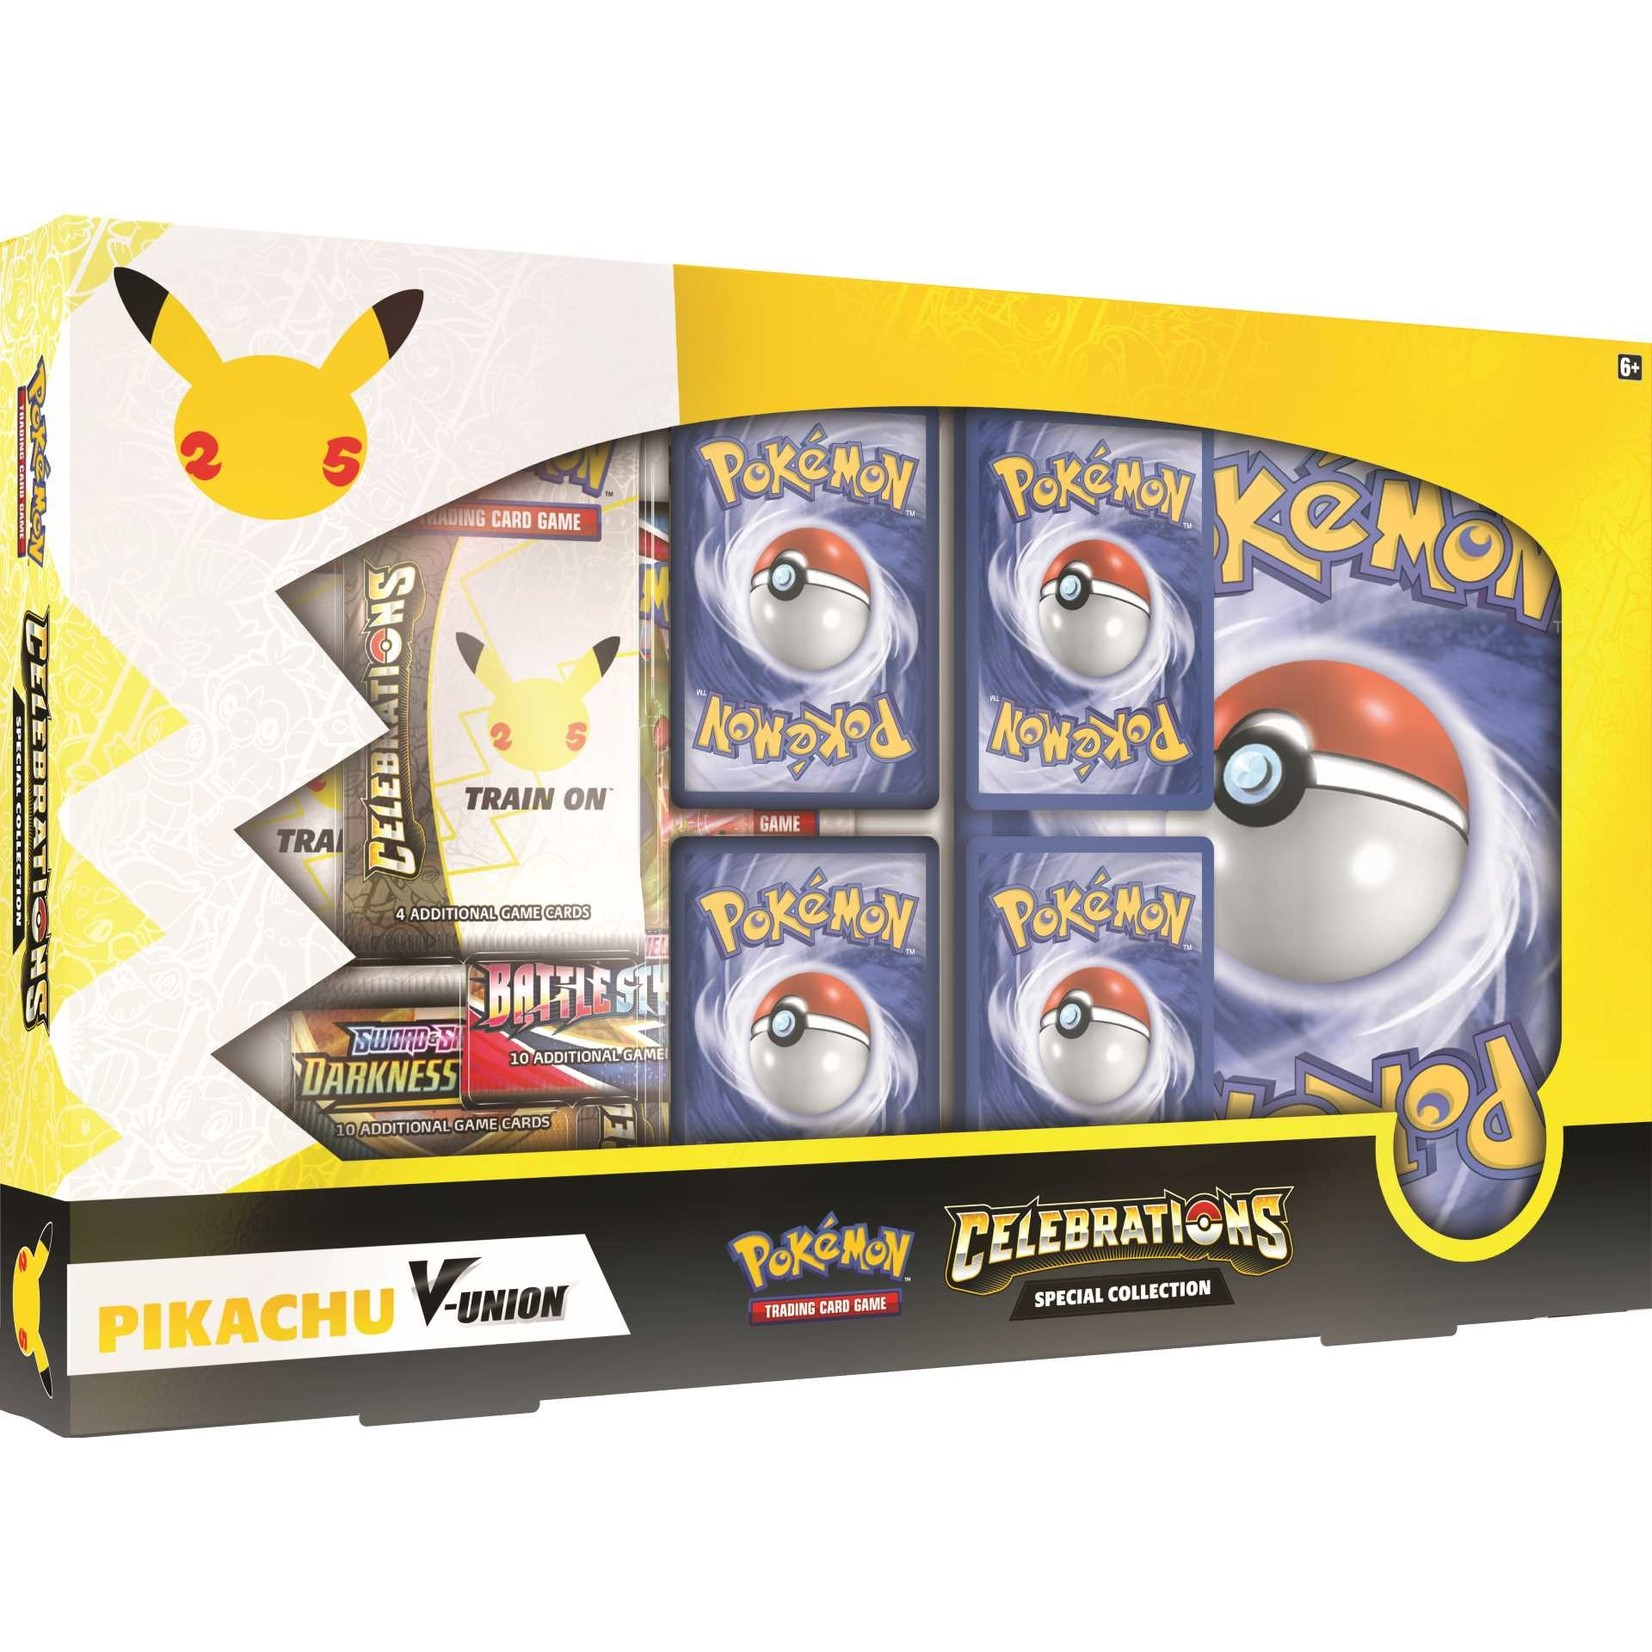 The Pokemon Company [Preorder] POKEMON CELEBRATIONS PIKACHU V-UNION